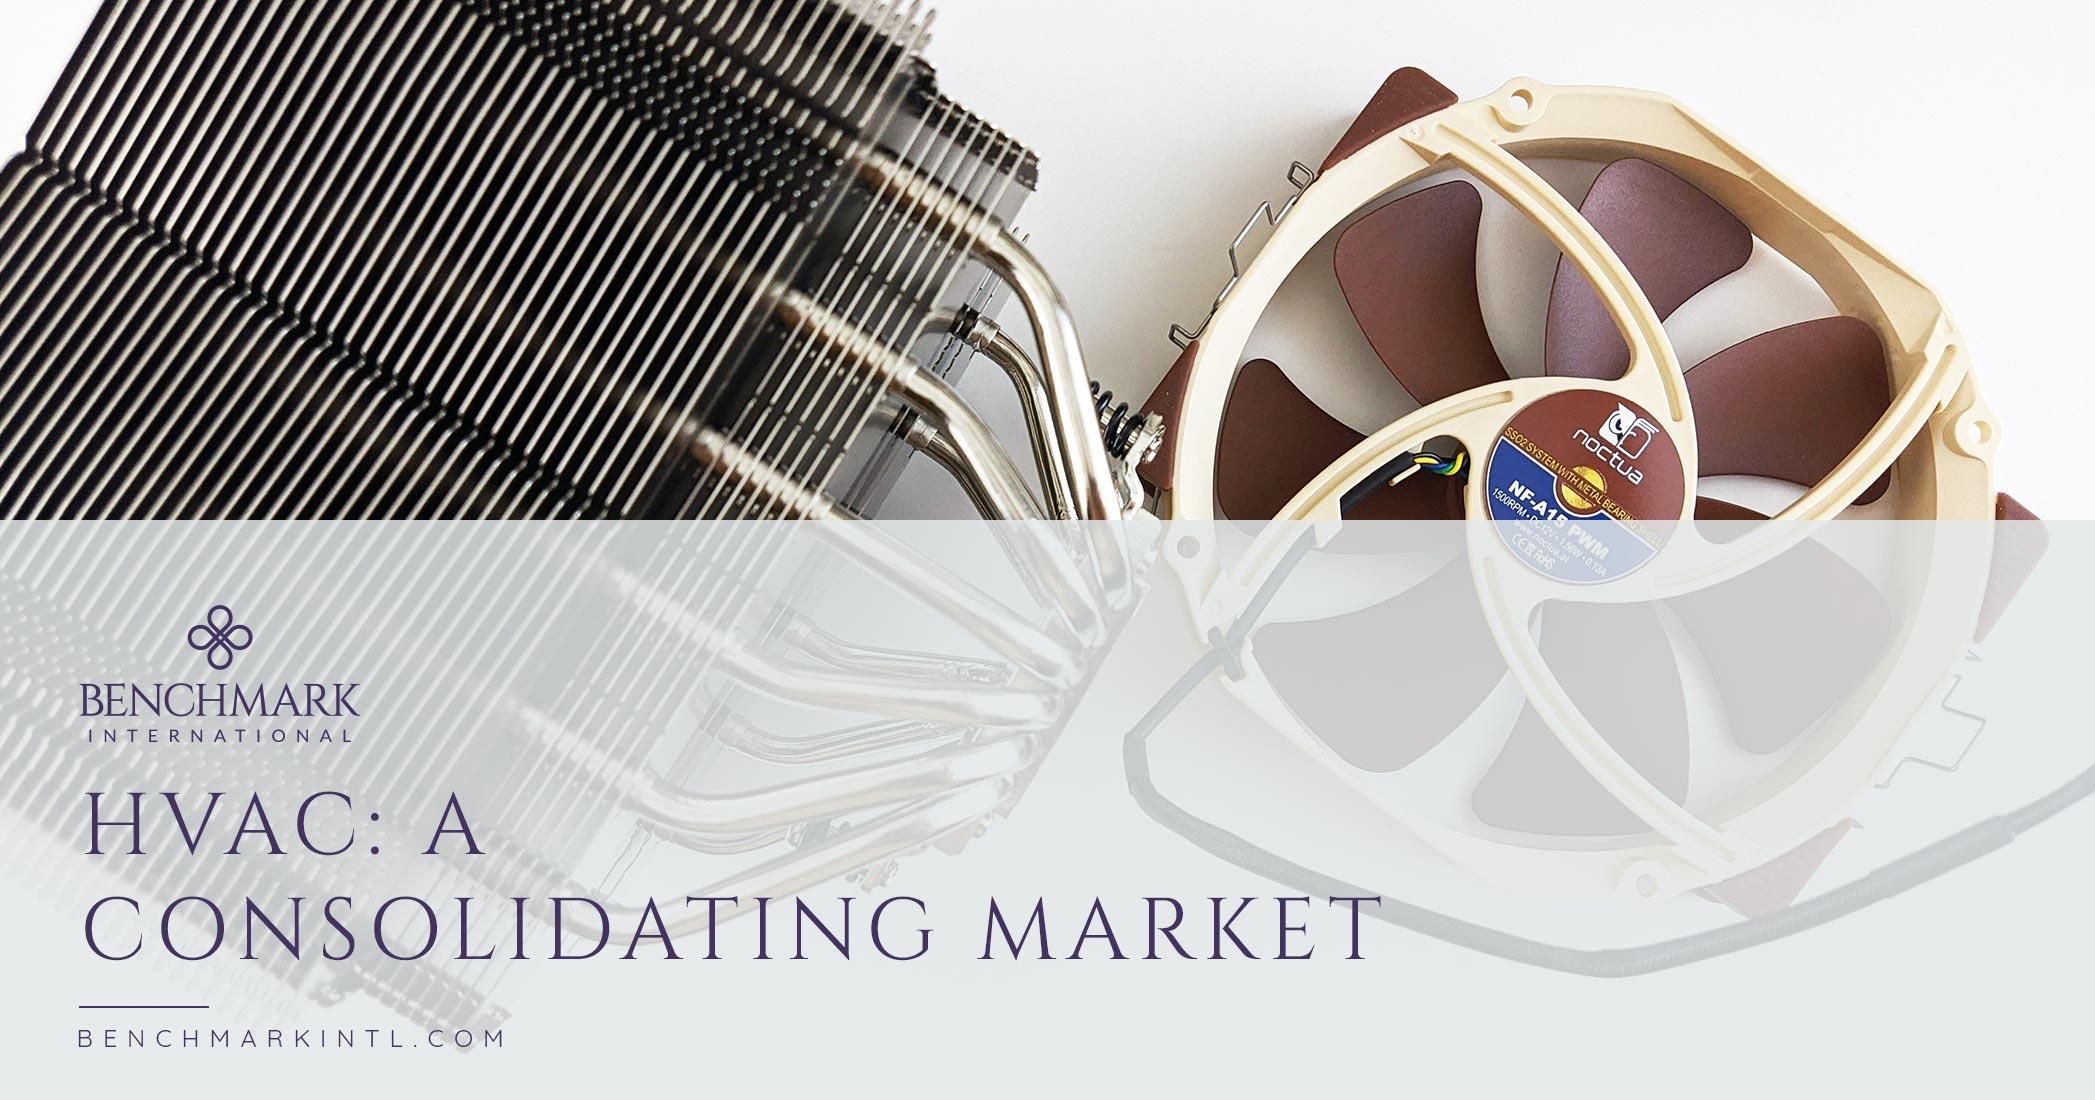 HVAC: A Consolidating Market